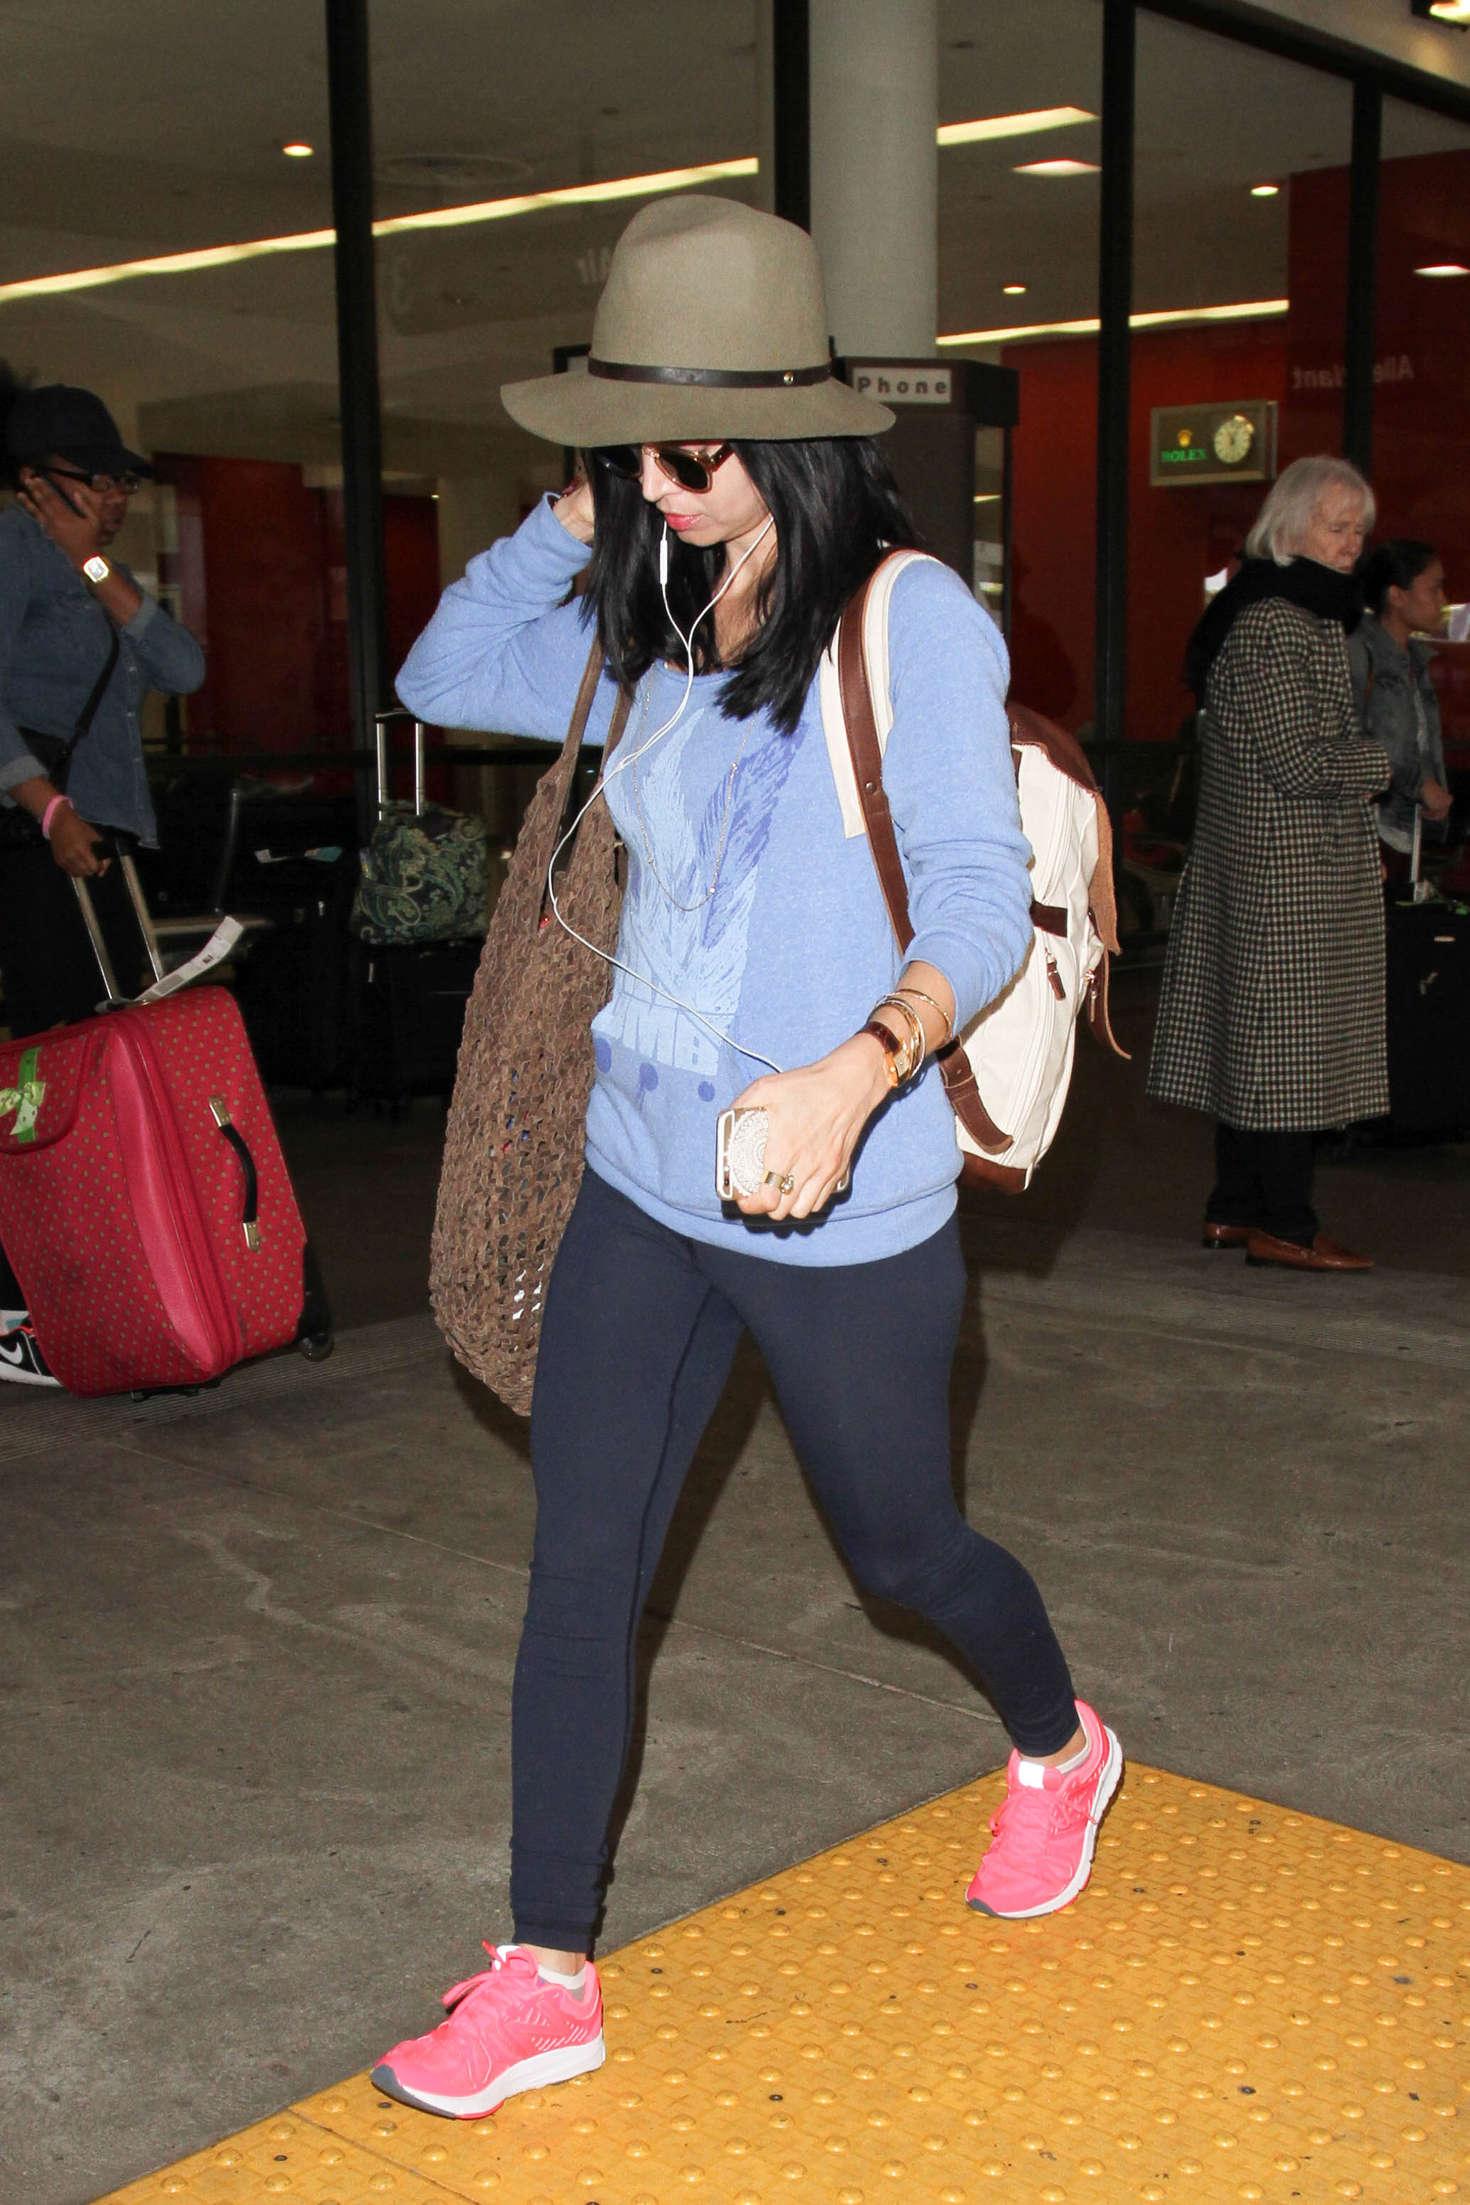 Eliza Dushku in Tights at LAX Airport in LA